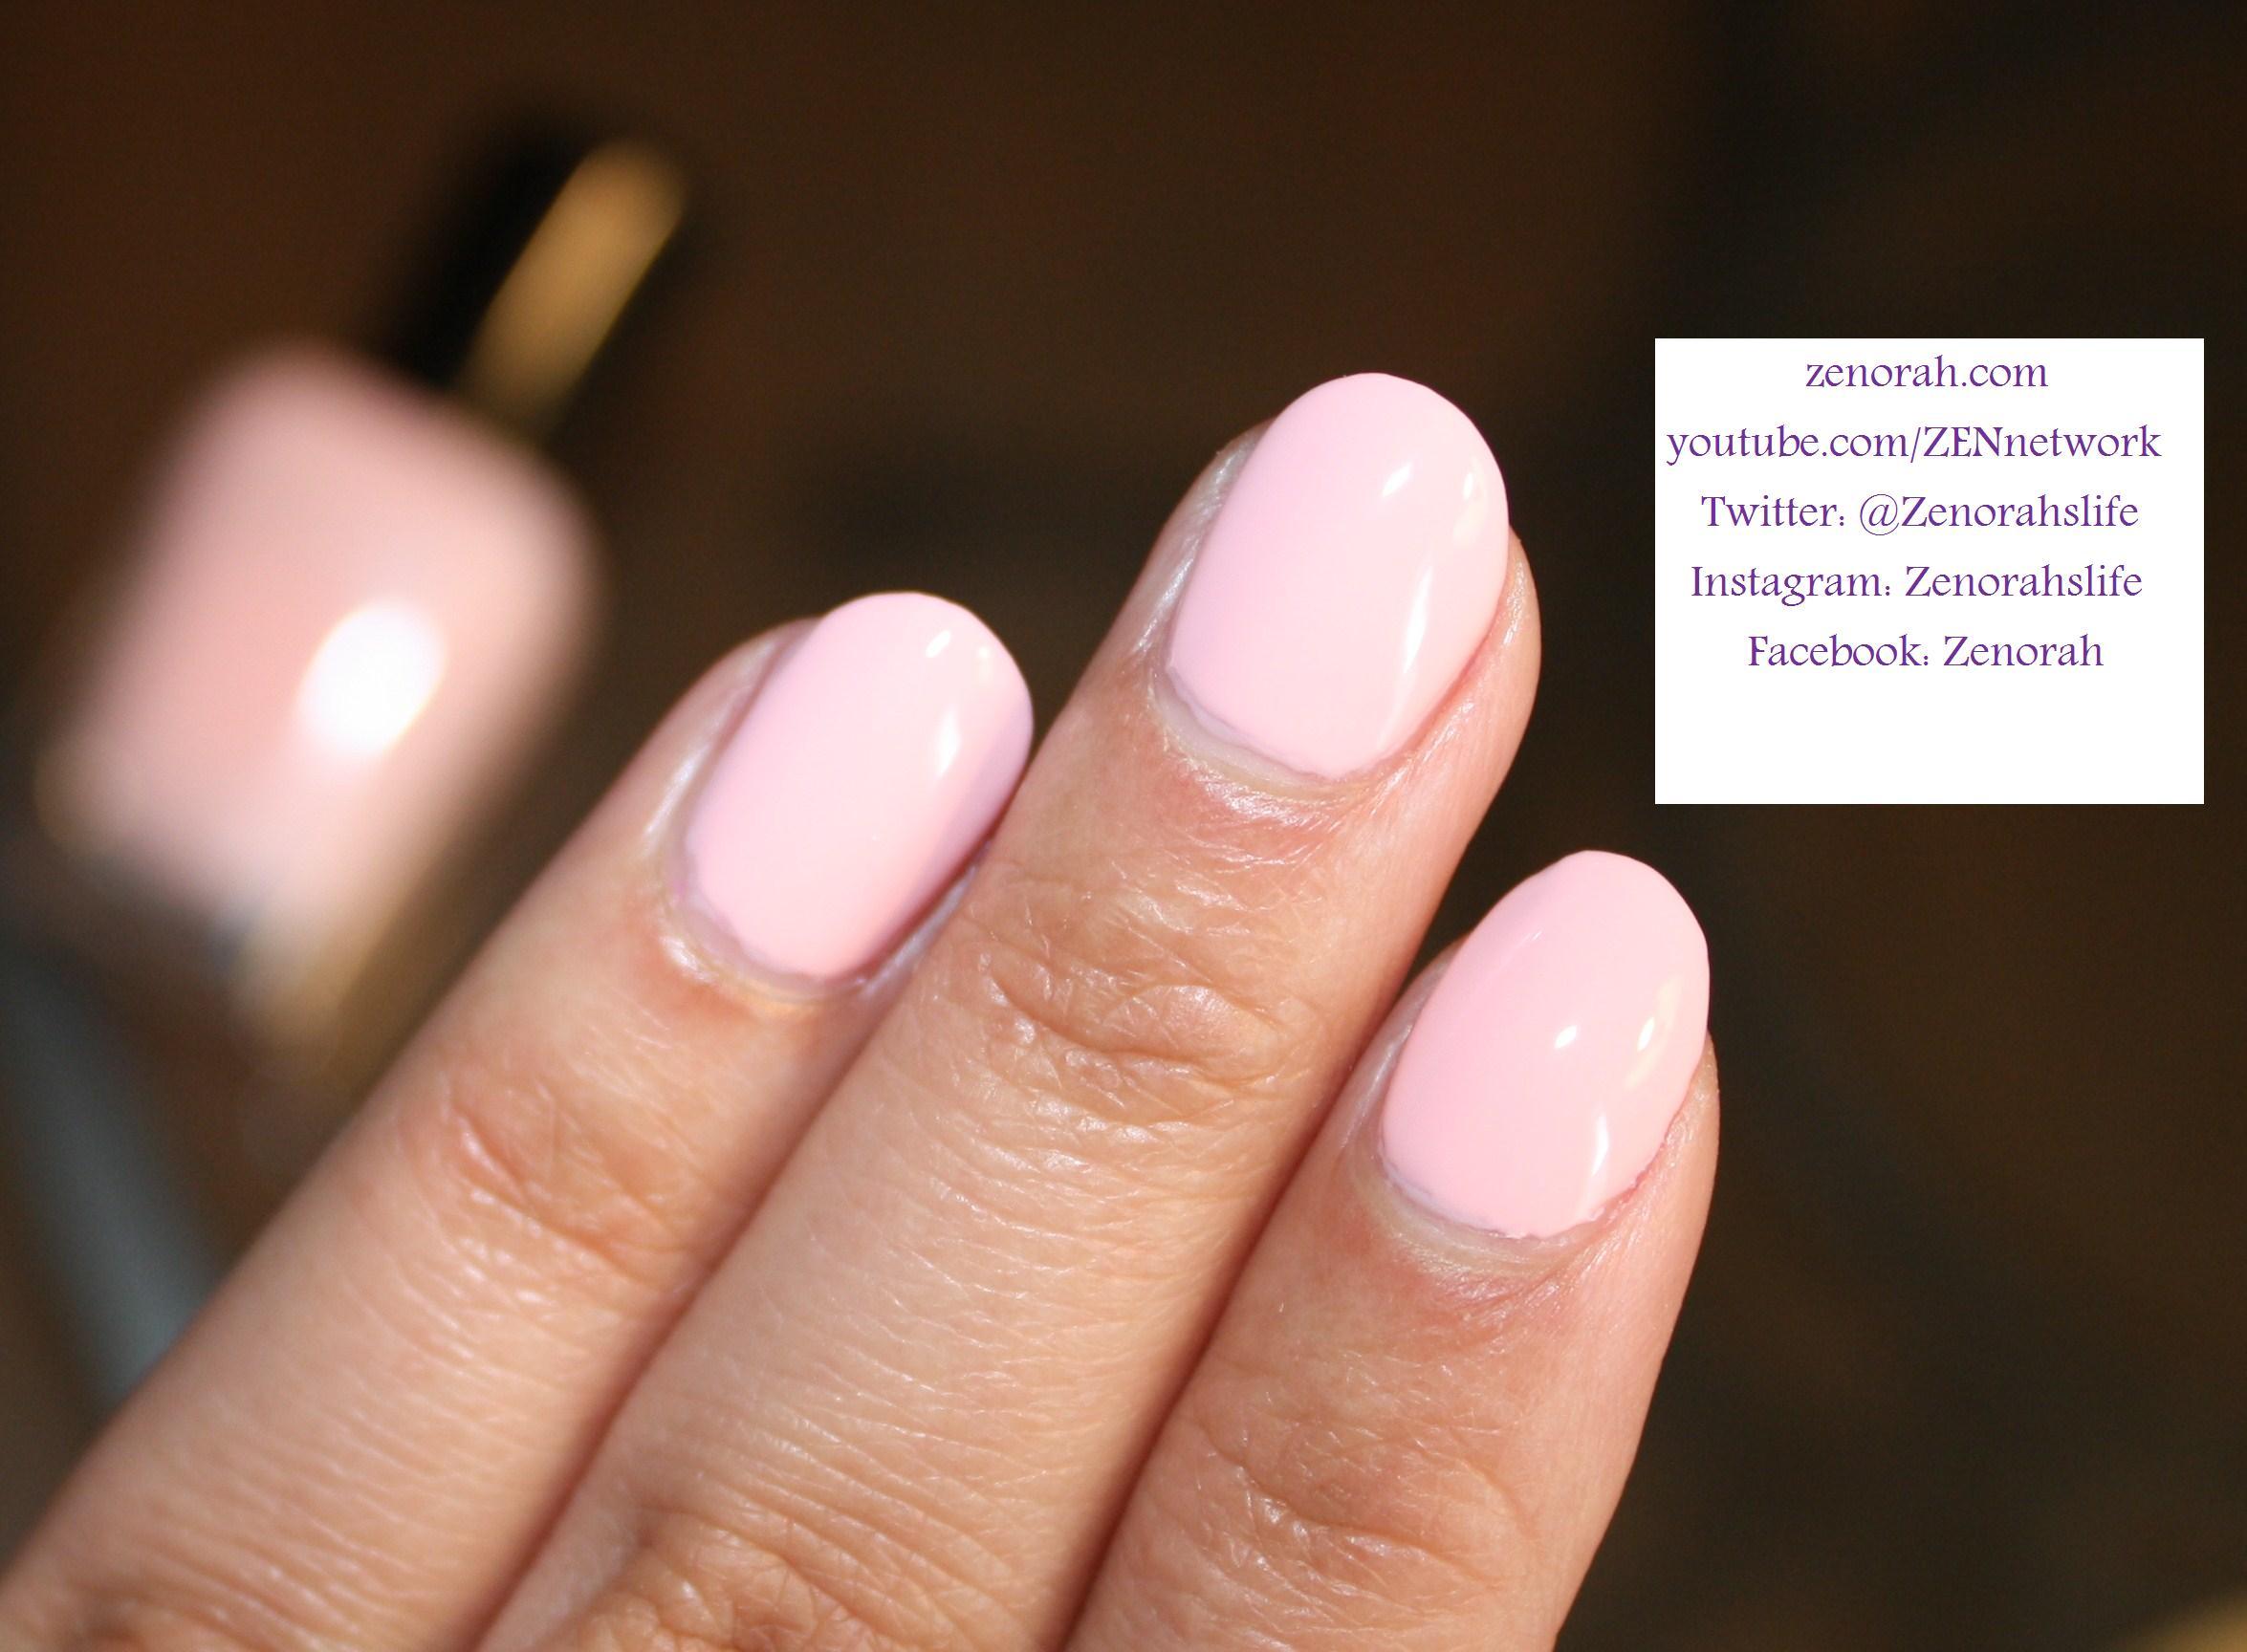 Zoya Dot nail polishZoya Dot